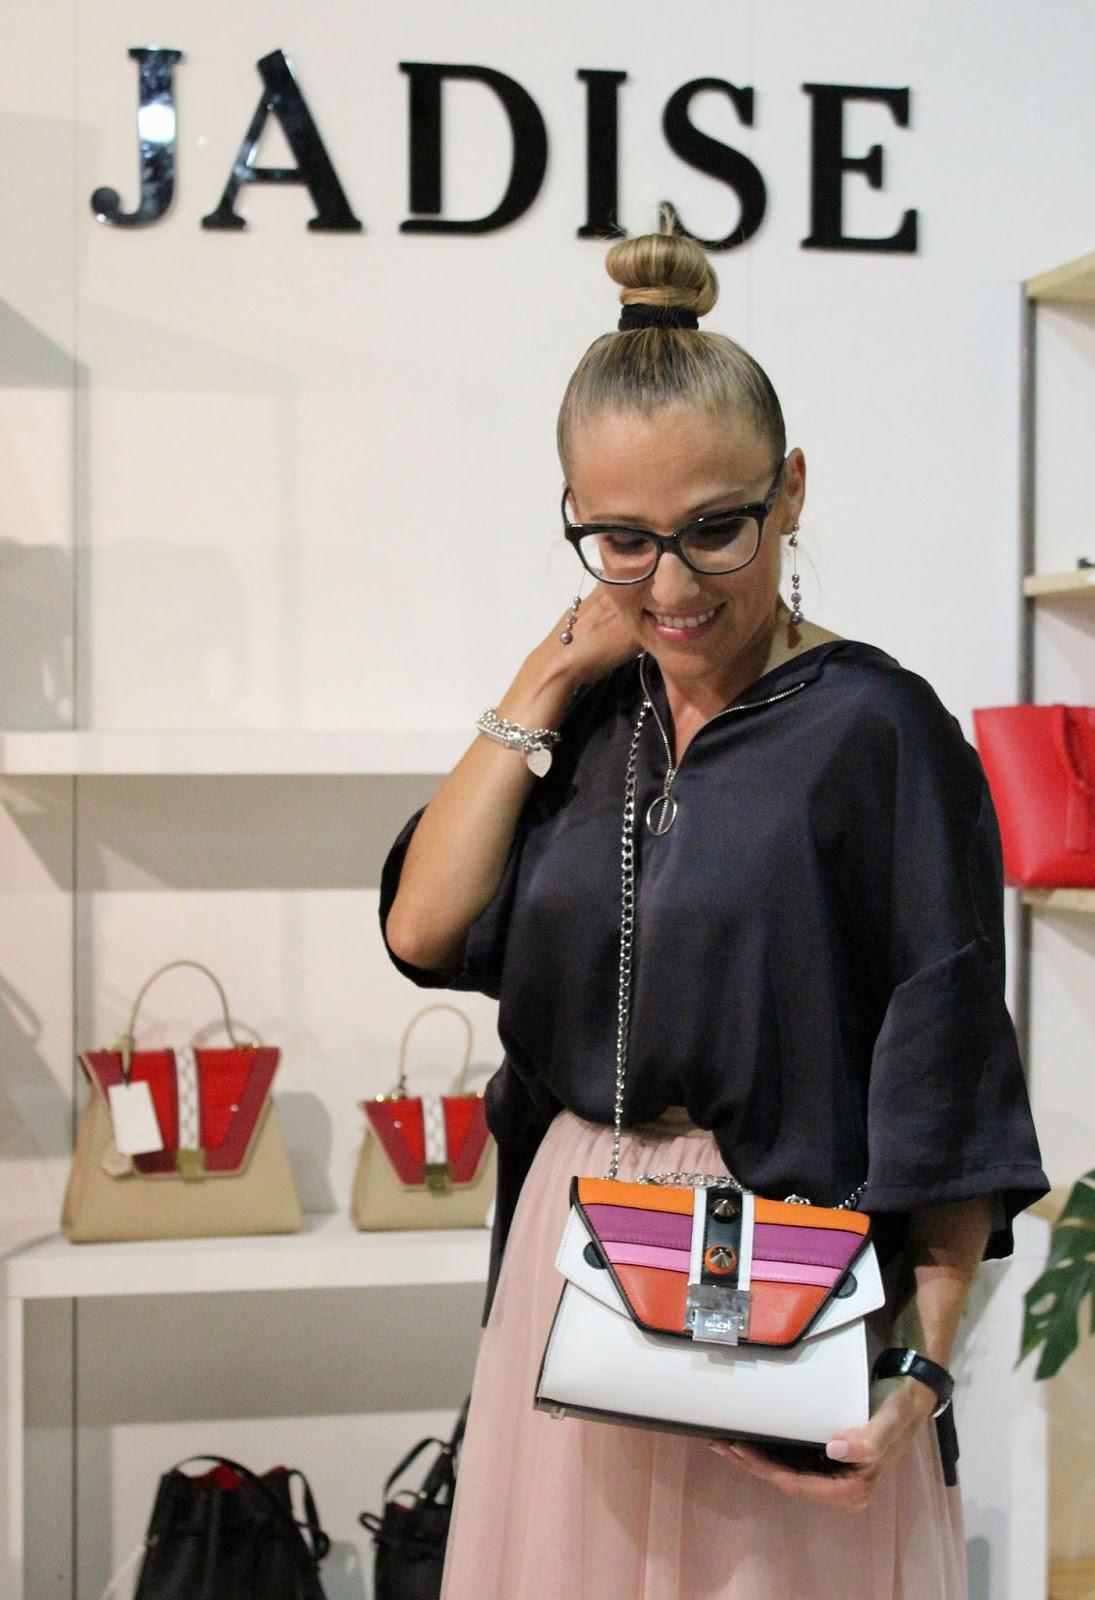 Eniwhere Fashion - Jadise bag - Micam